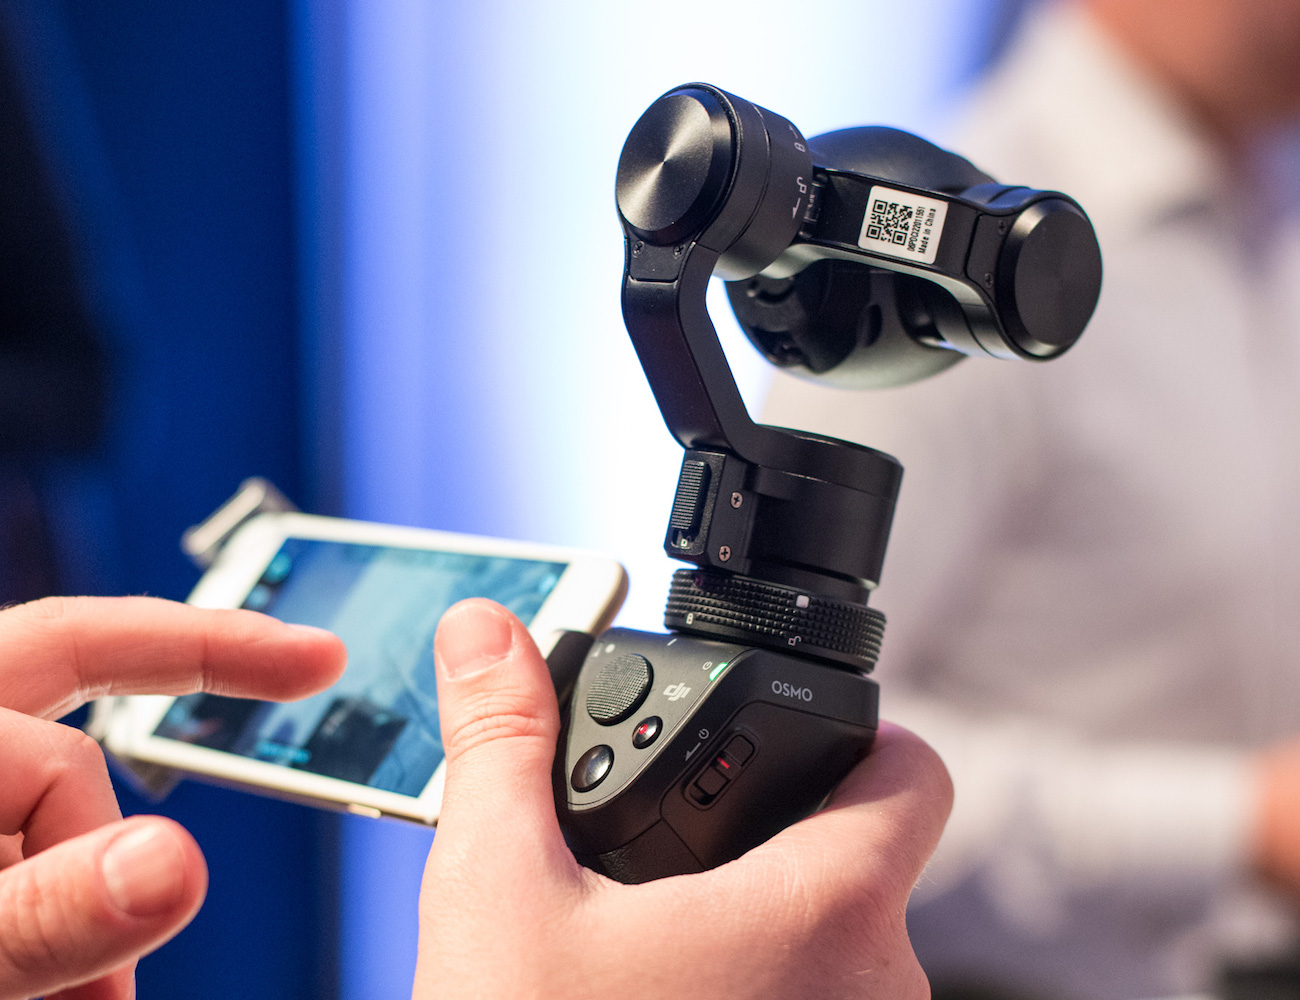 Osmo – The Handheld 4K Camera by DJI